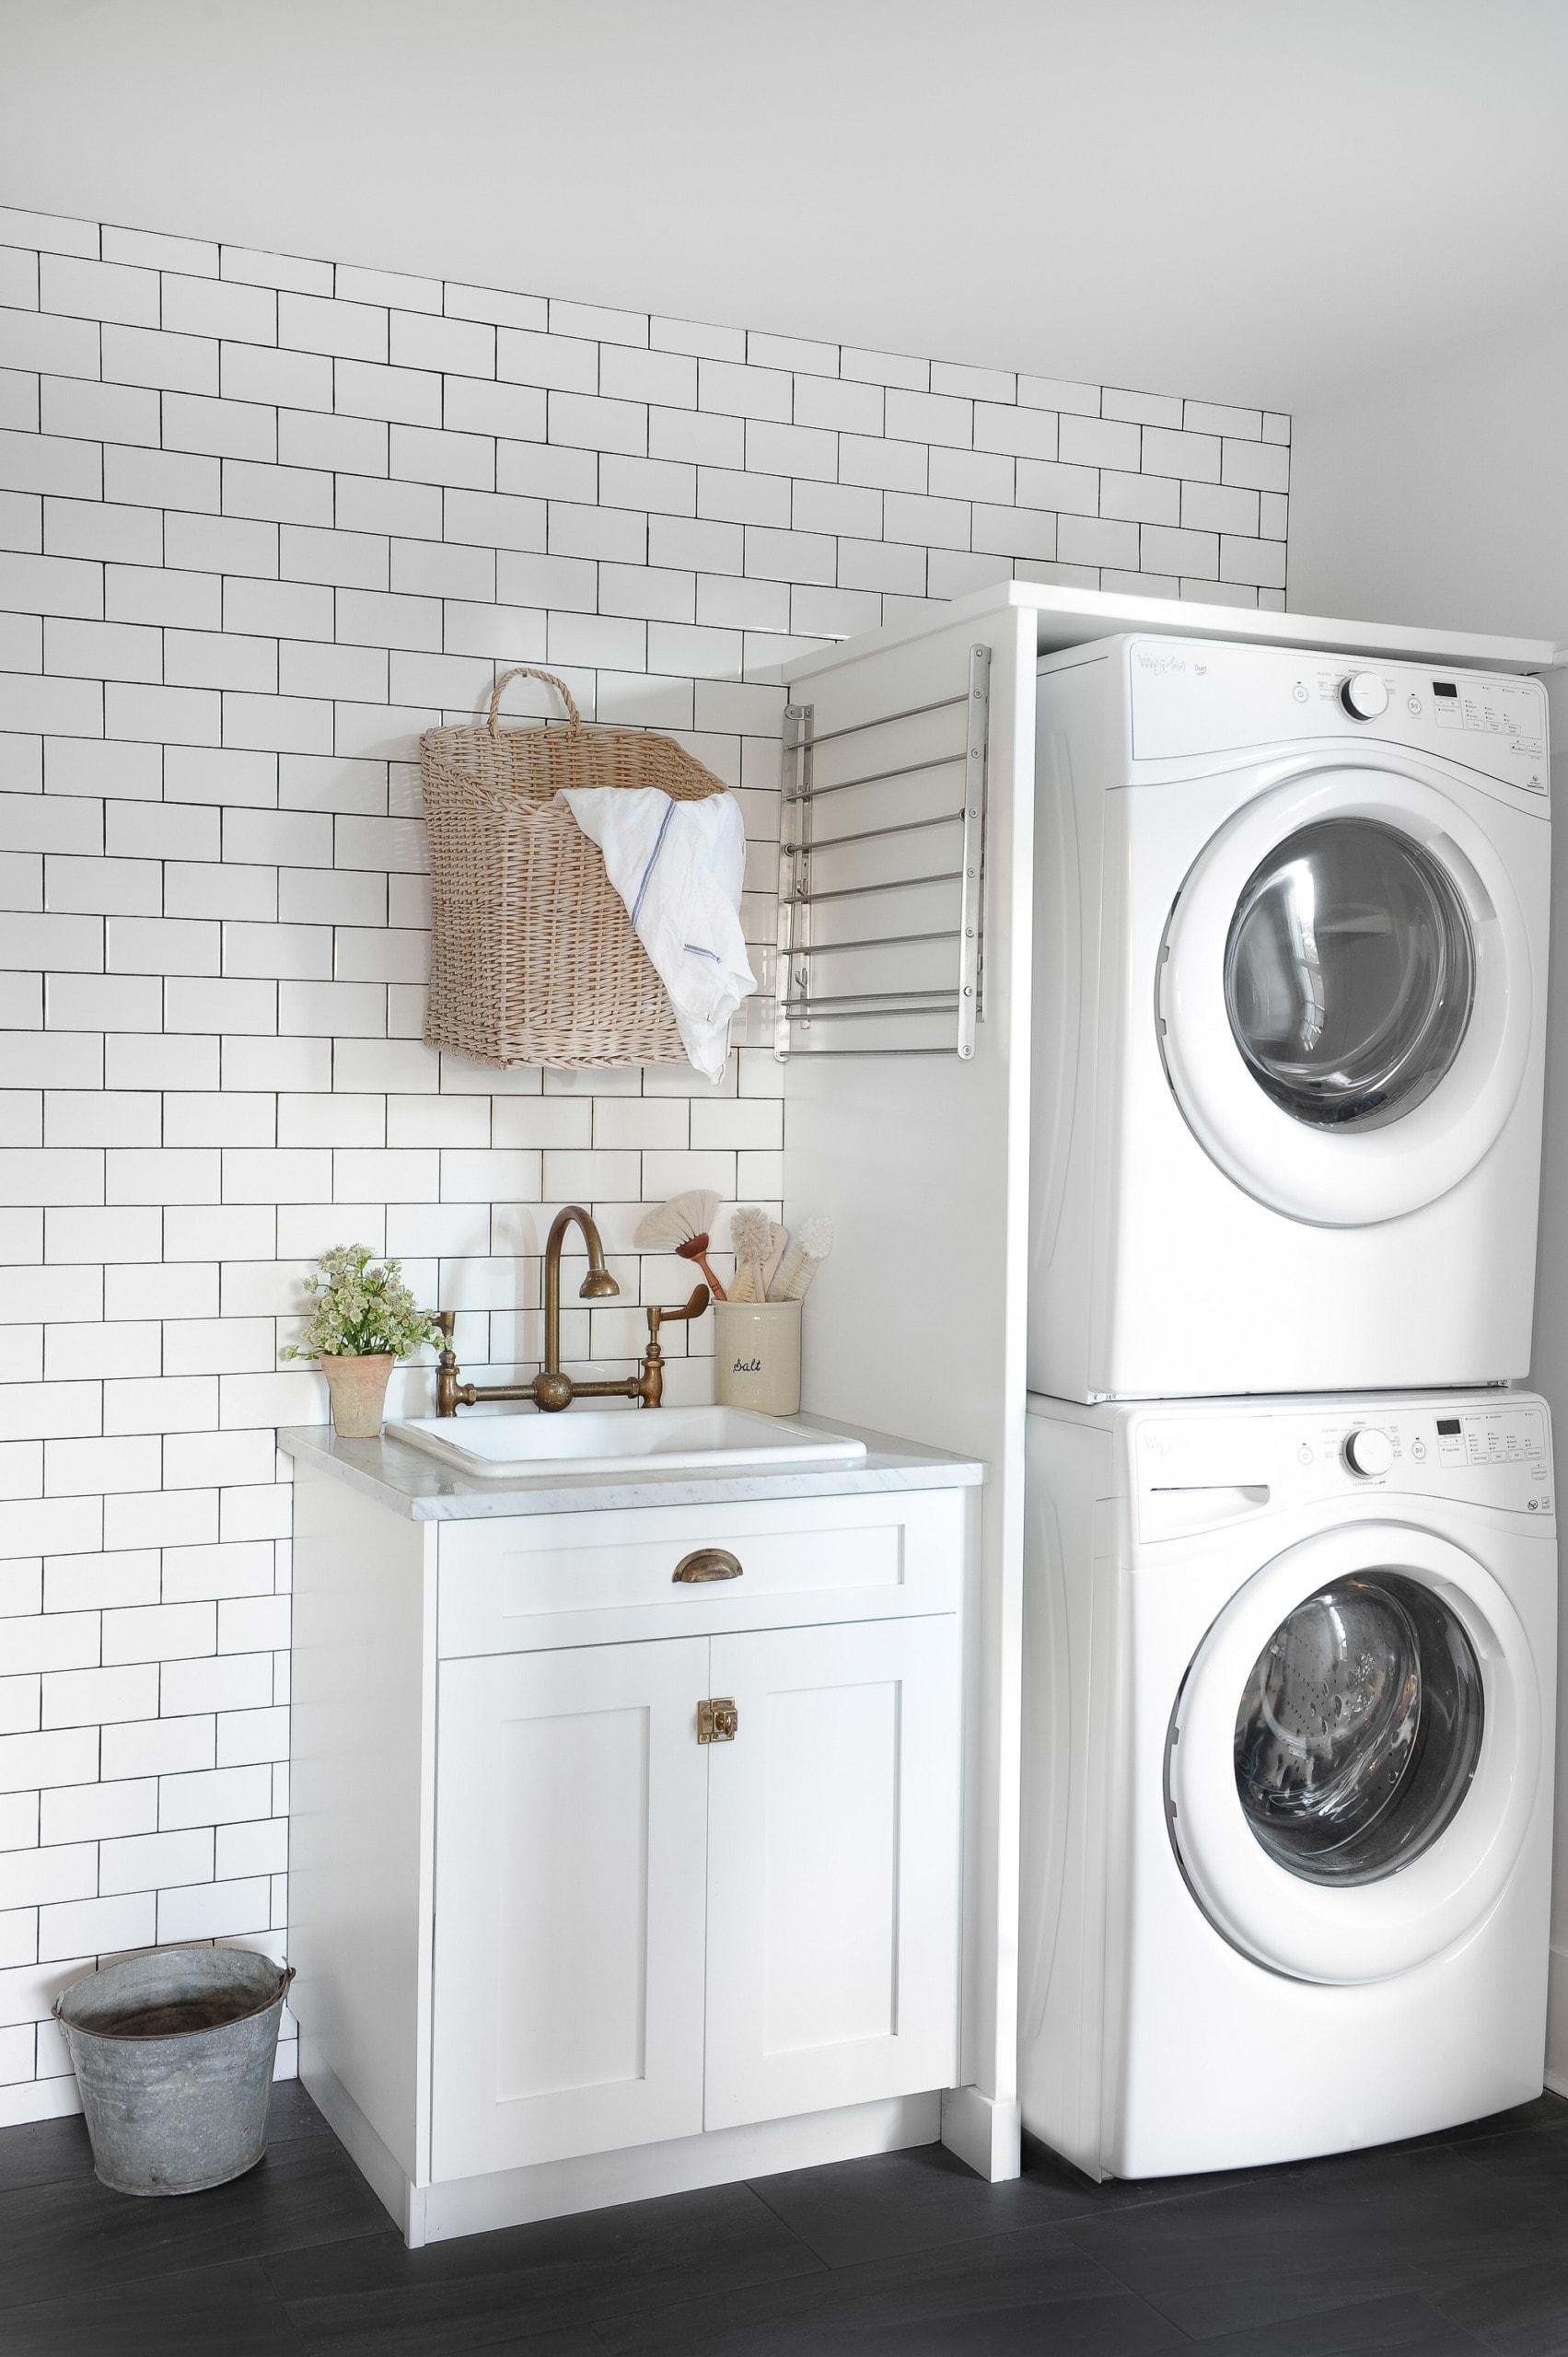 Cute laundry setup in a beach house